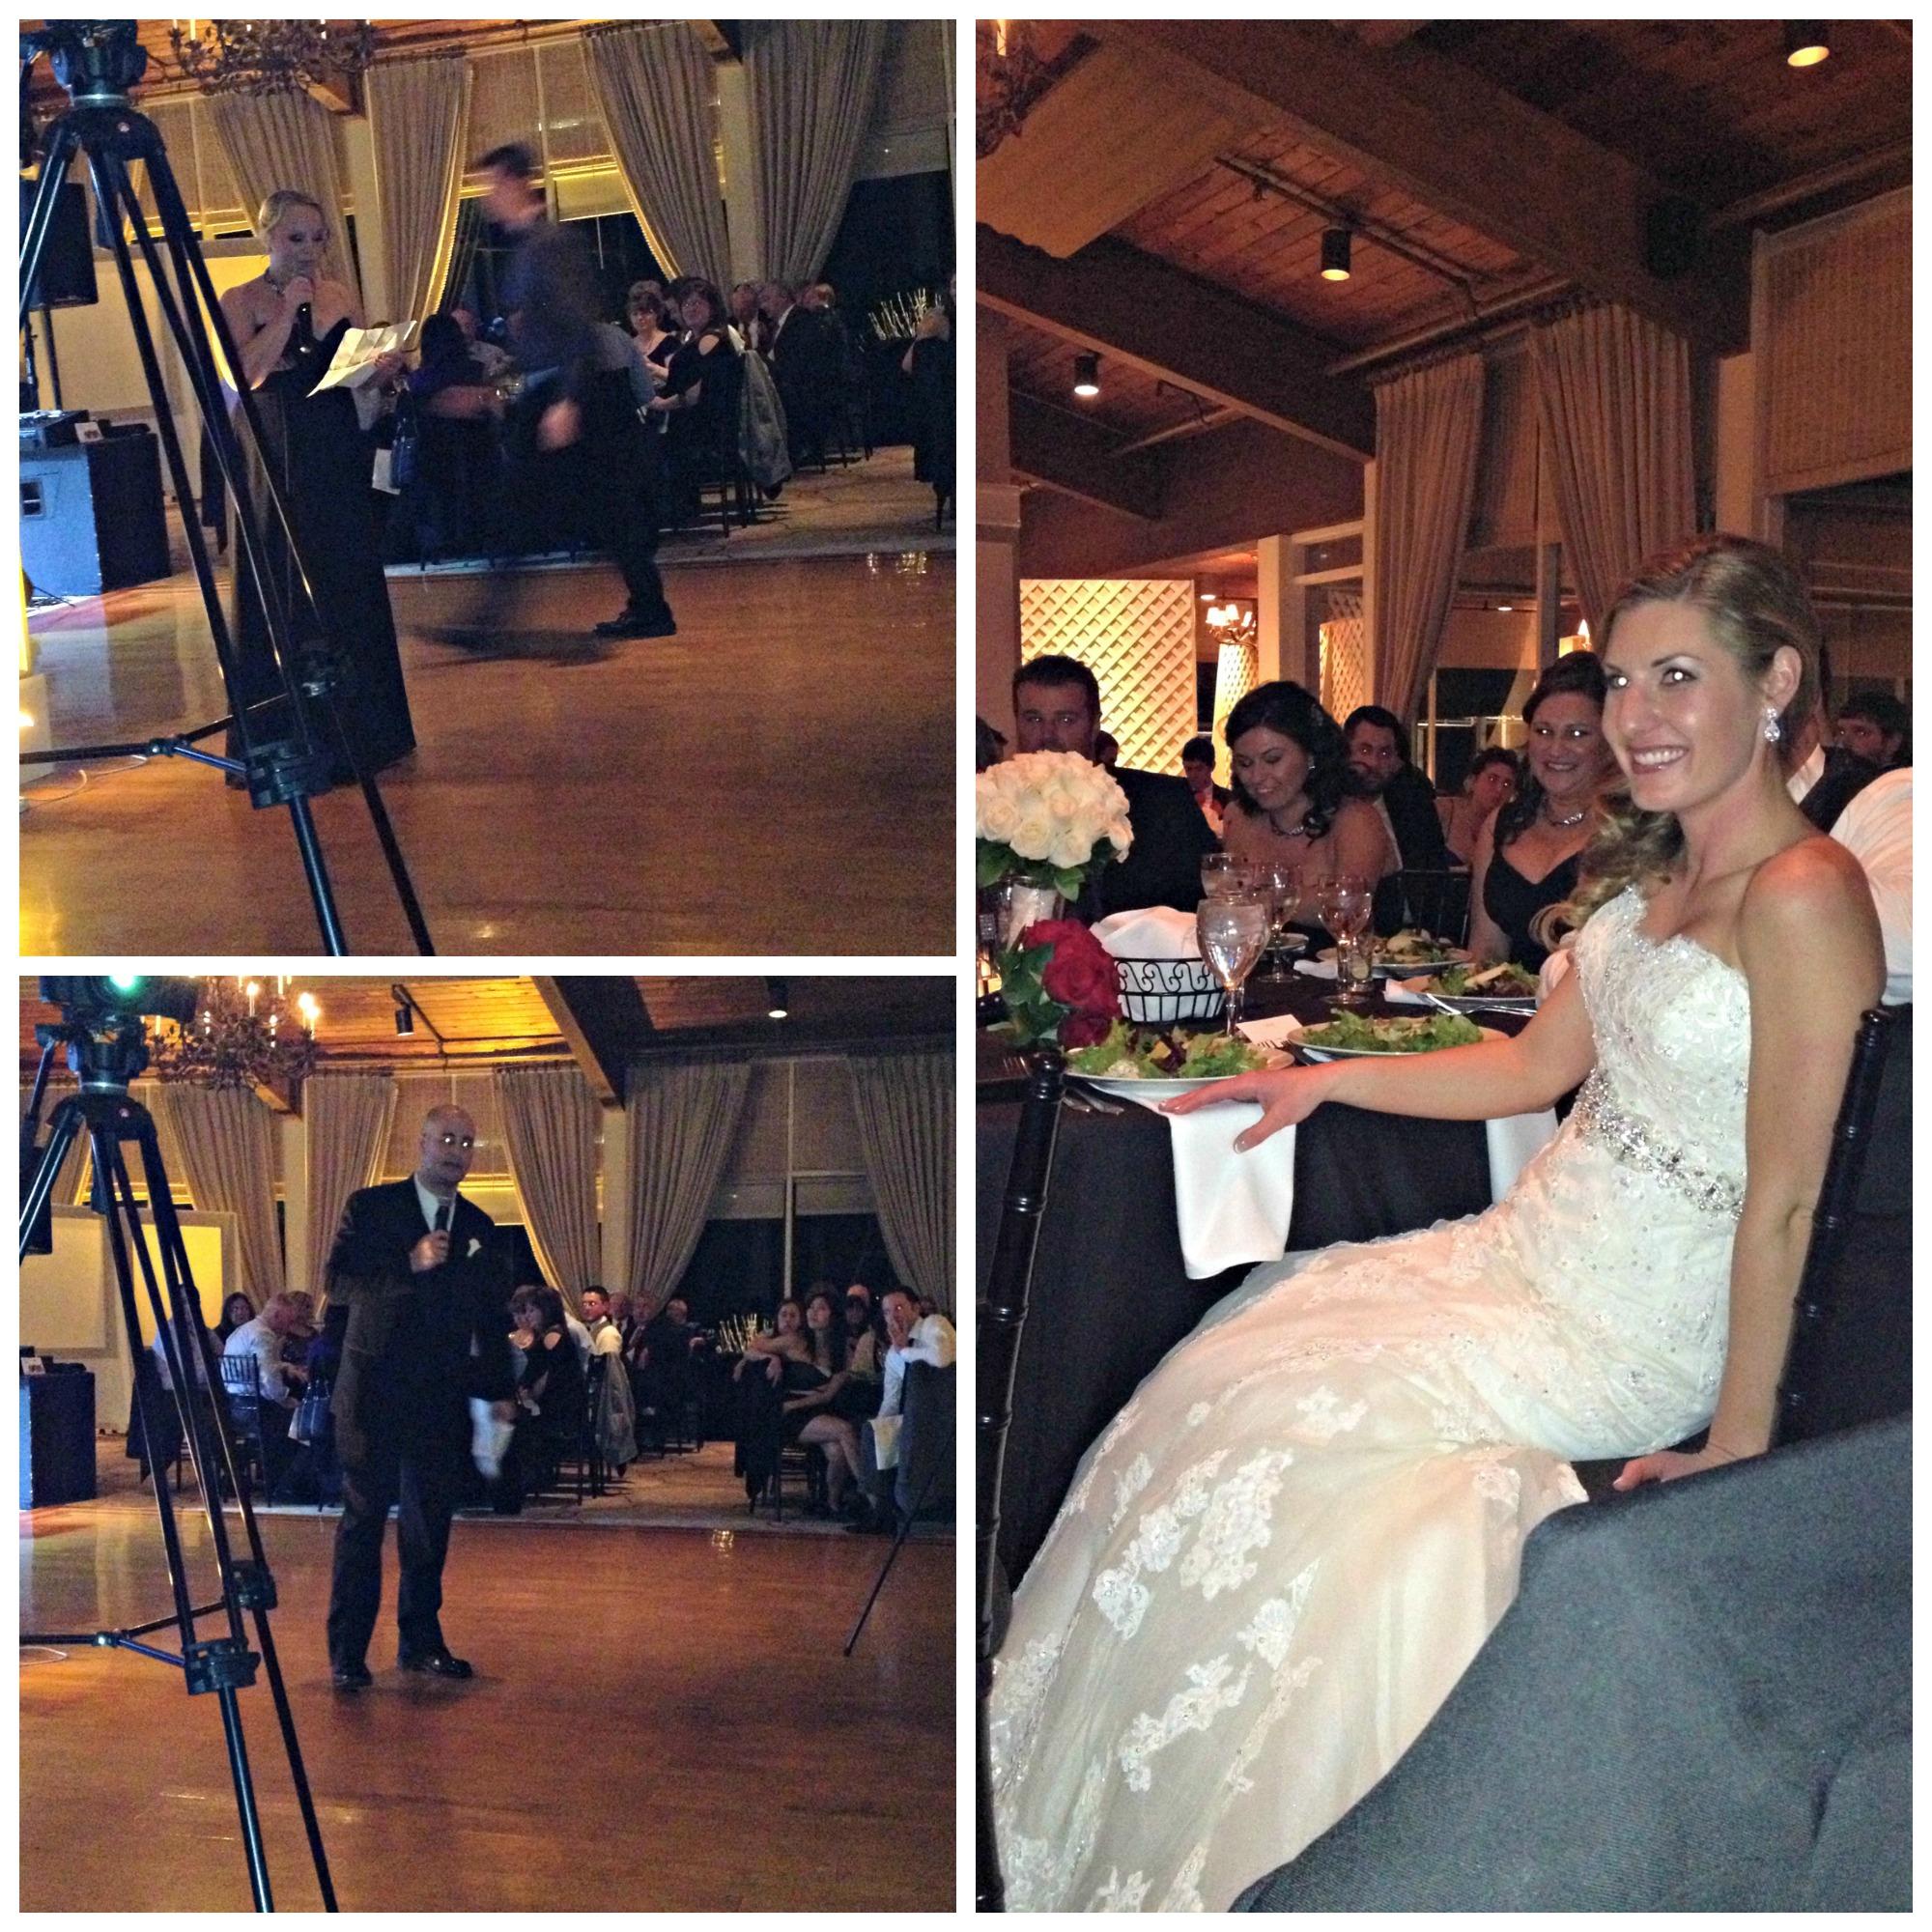 Cate and Joe's Wedding Speeches